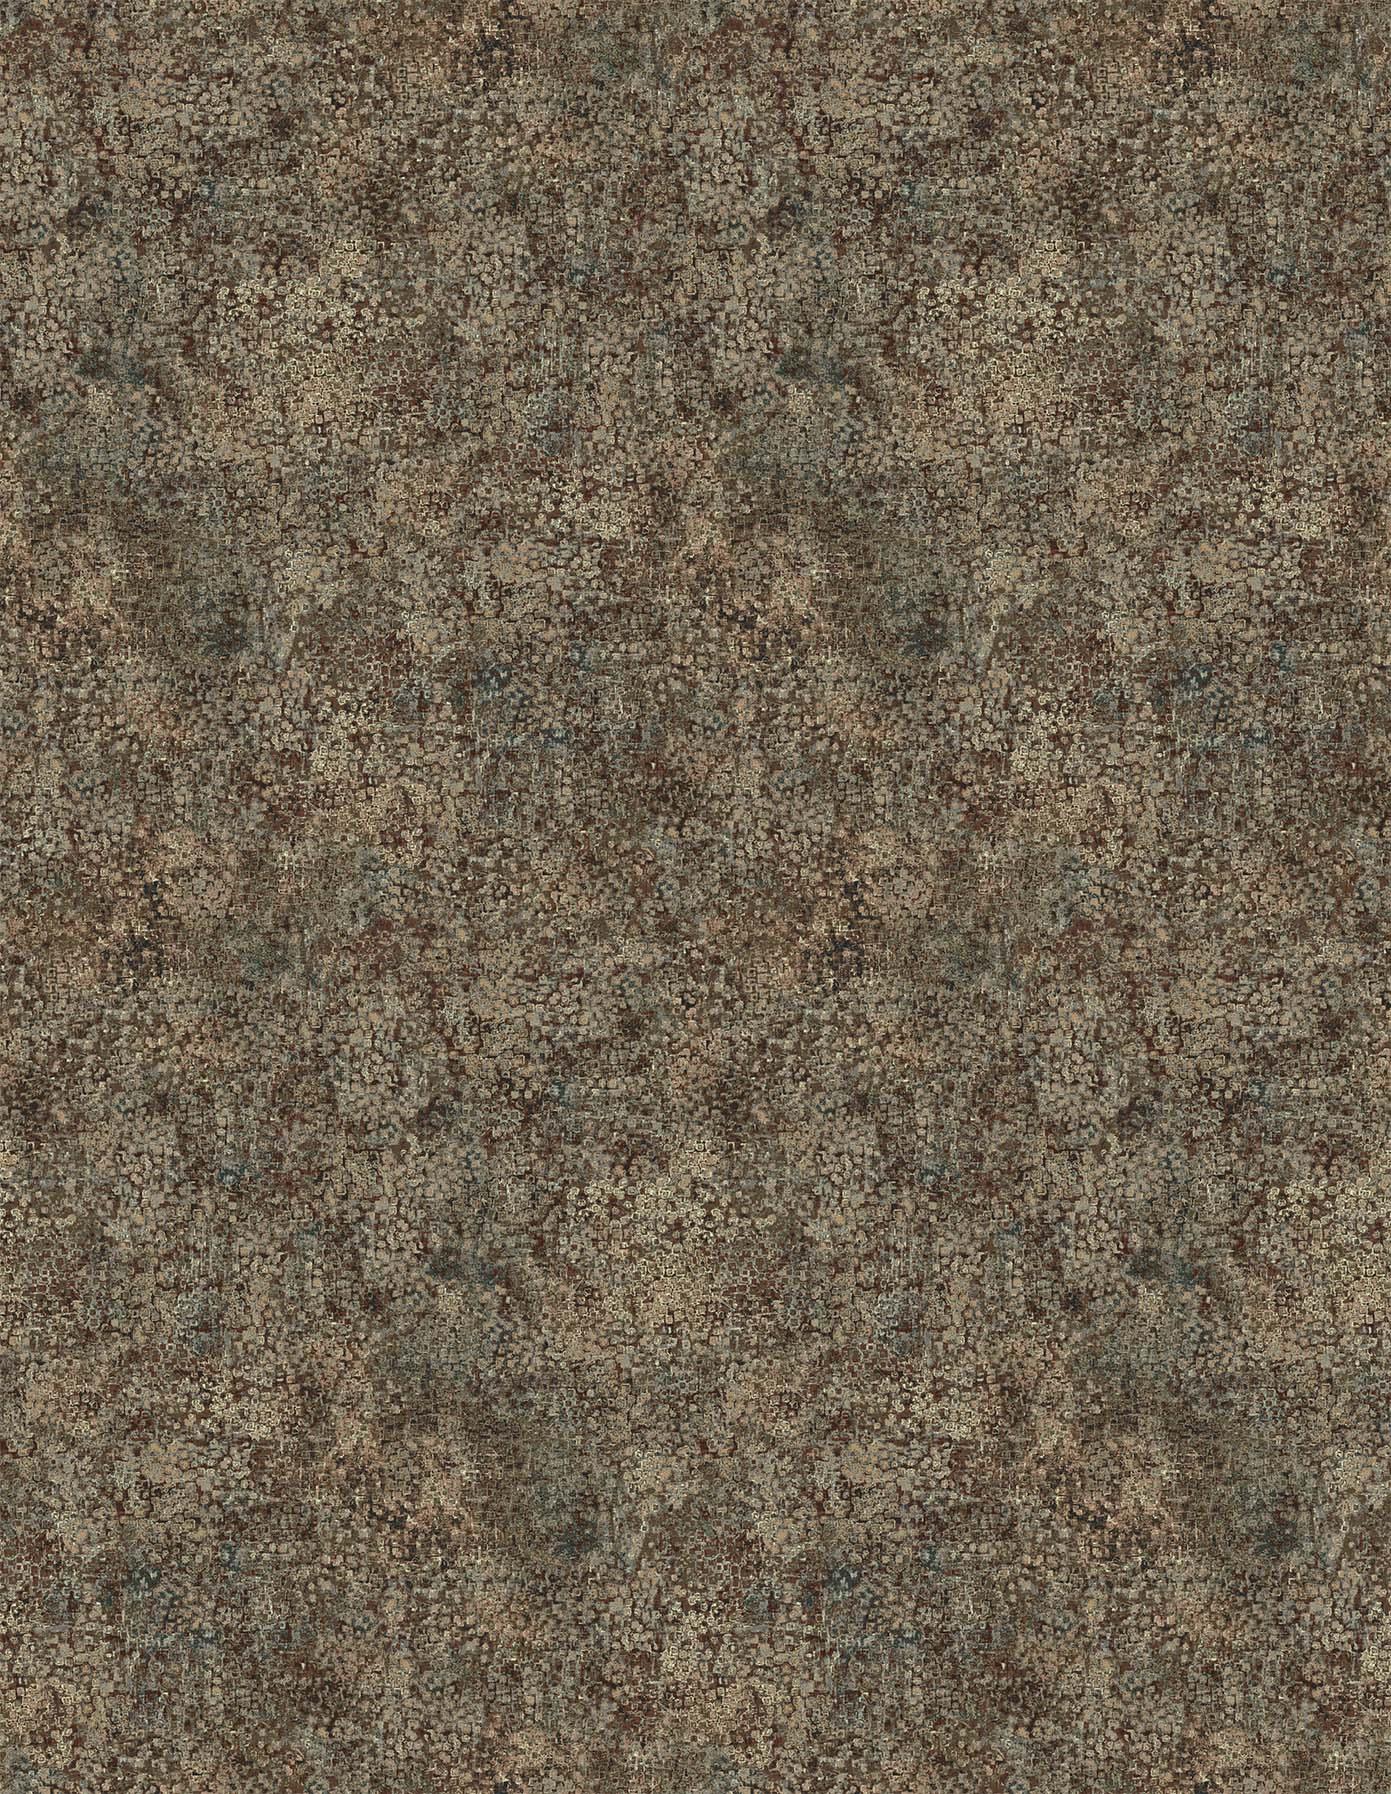 Ophelia Brown Multi  Calcite Texture